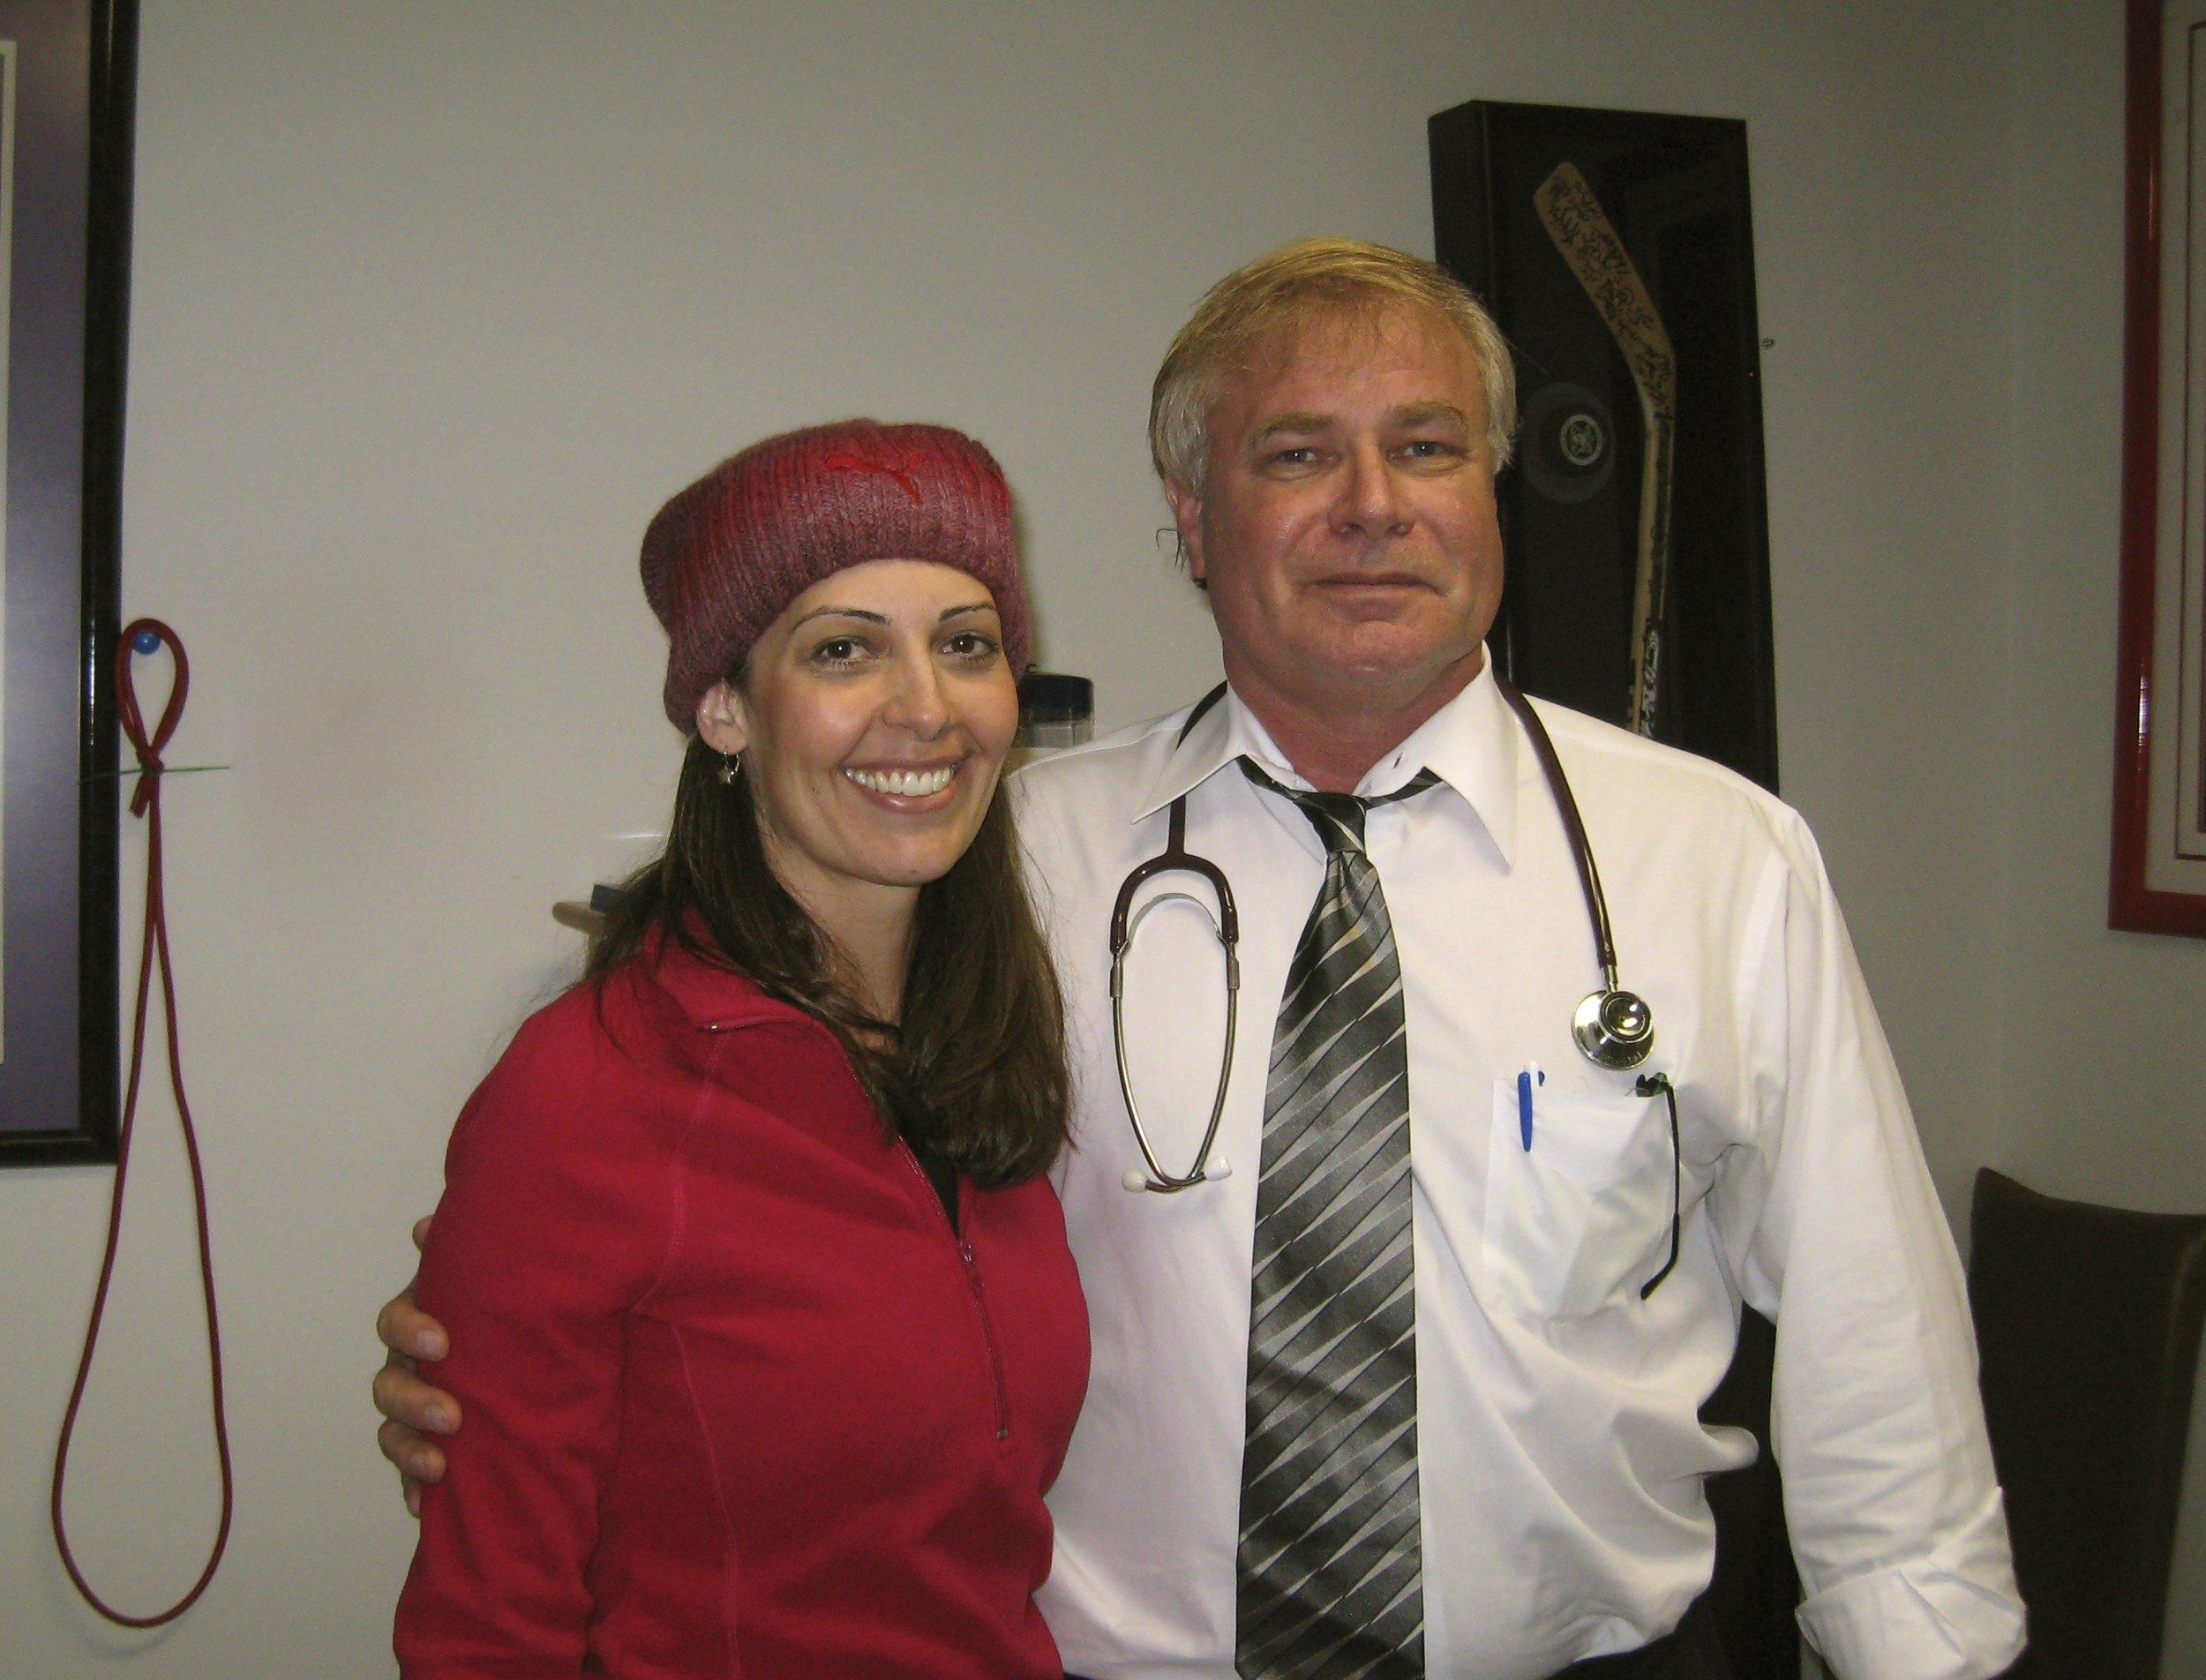 Me & Dr. Plance circa 2011